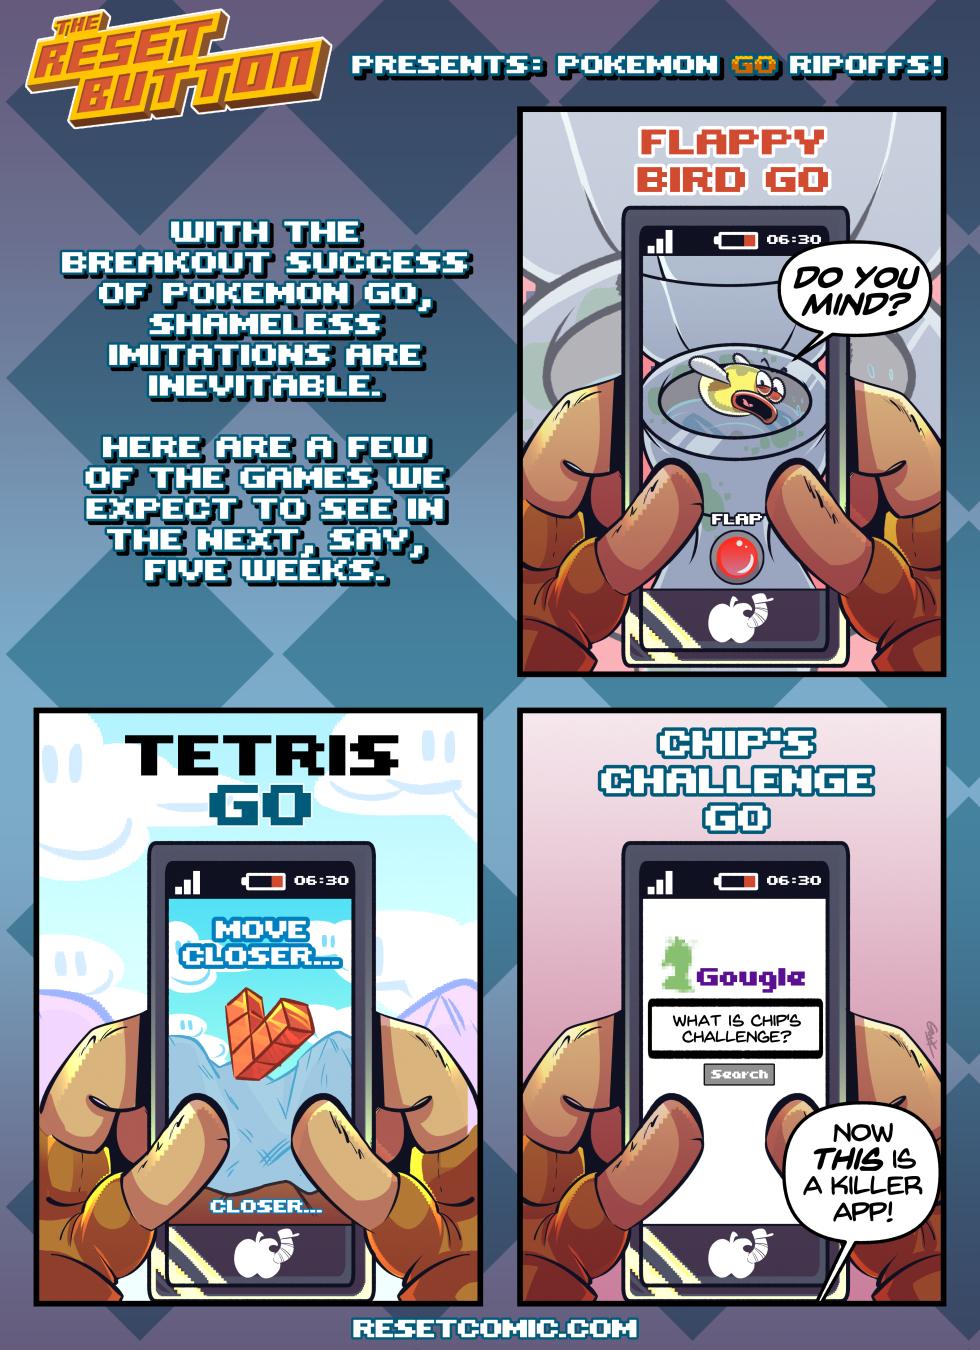 The Reset Button Presents: Pokemon Go Ripoffs